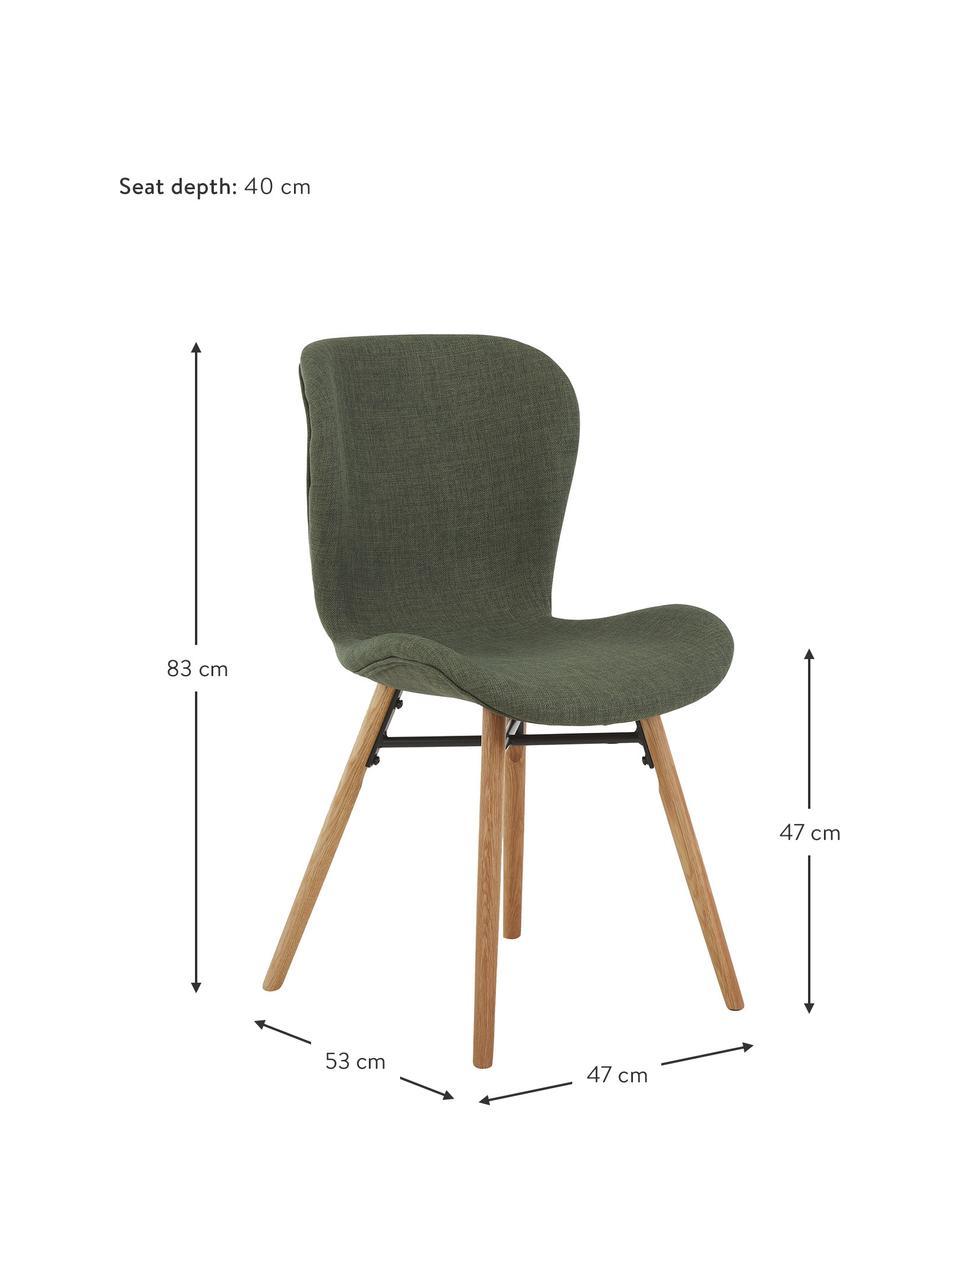 Gestoffeerde stoelen Batilda in groen, 2 stuks, Bekleding: polyester, Poten: gelakt en geolied massief, Geweven stof groen, eikenhout, B 47 x D 53 cm